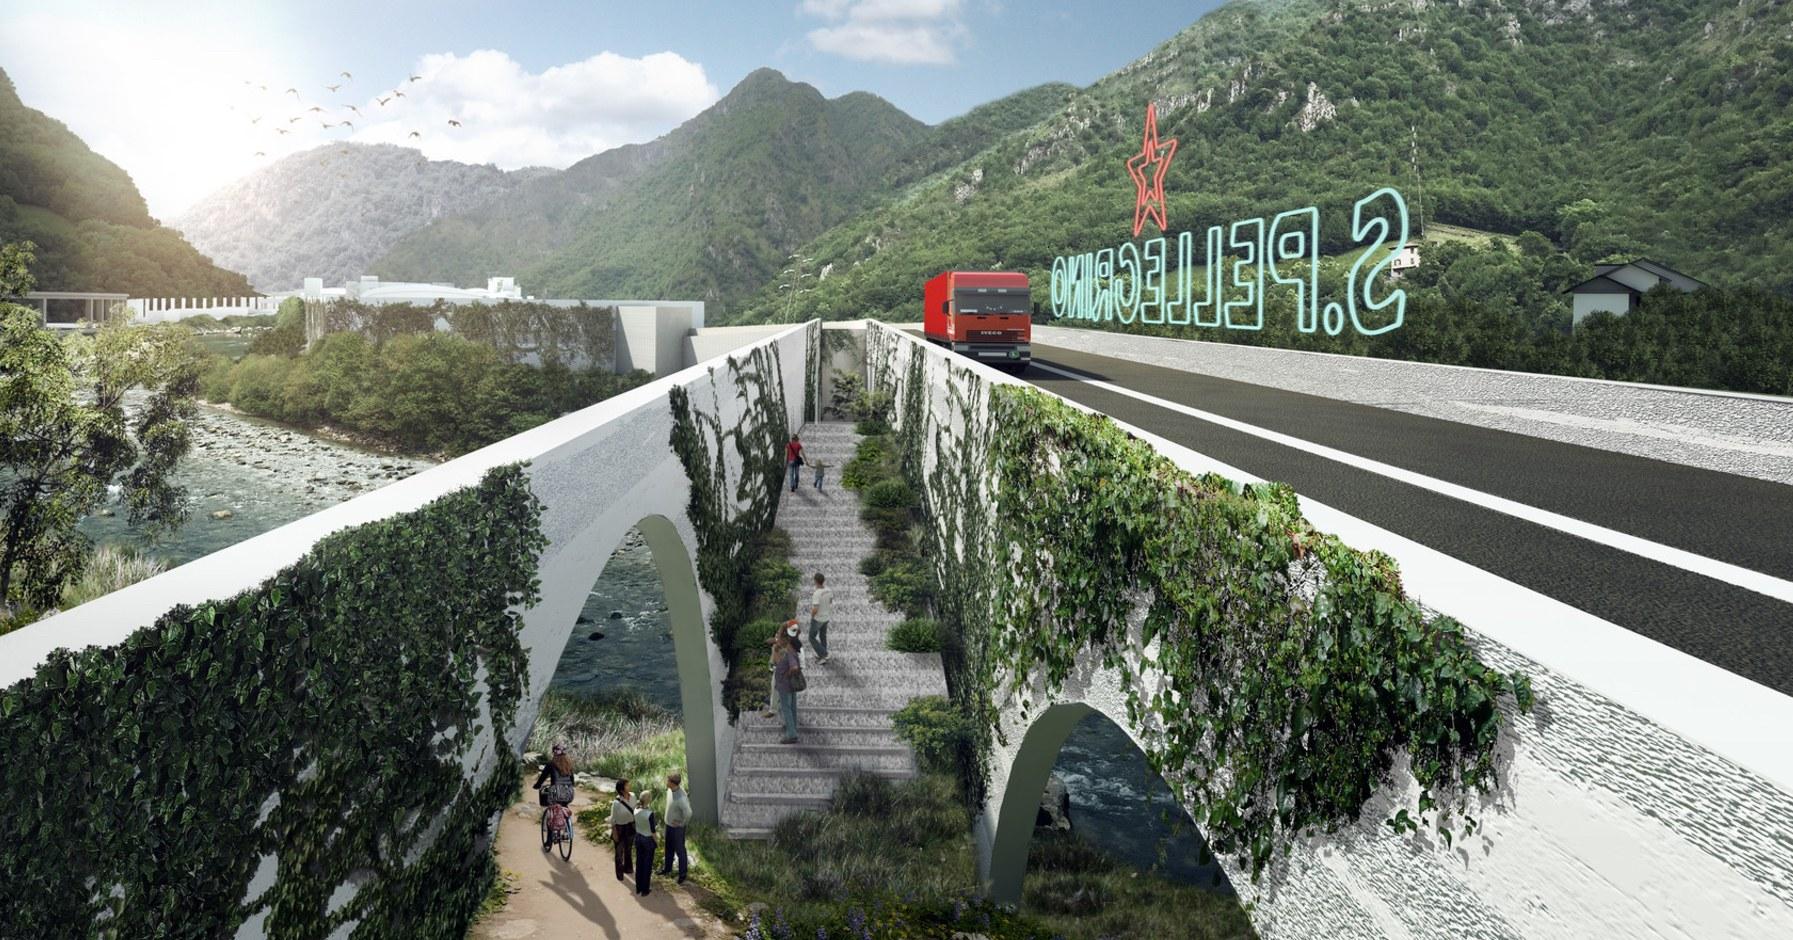 Bjarke Ingels Reveals Designs For A Futuristic San Pellegrino Headquarters photo